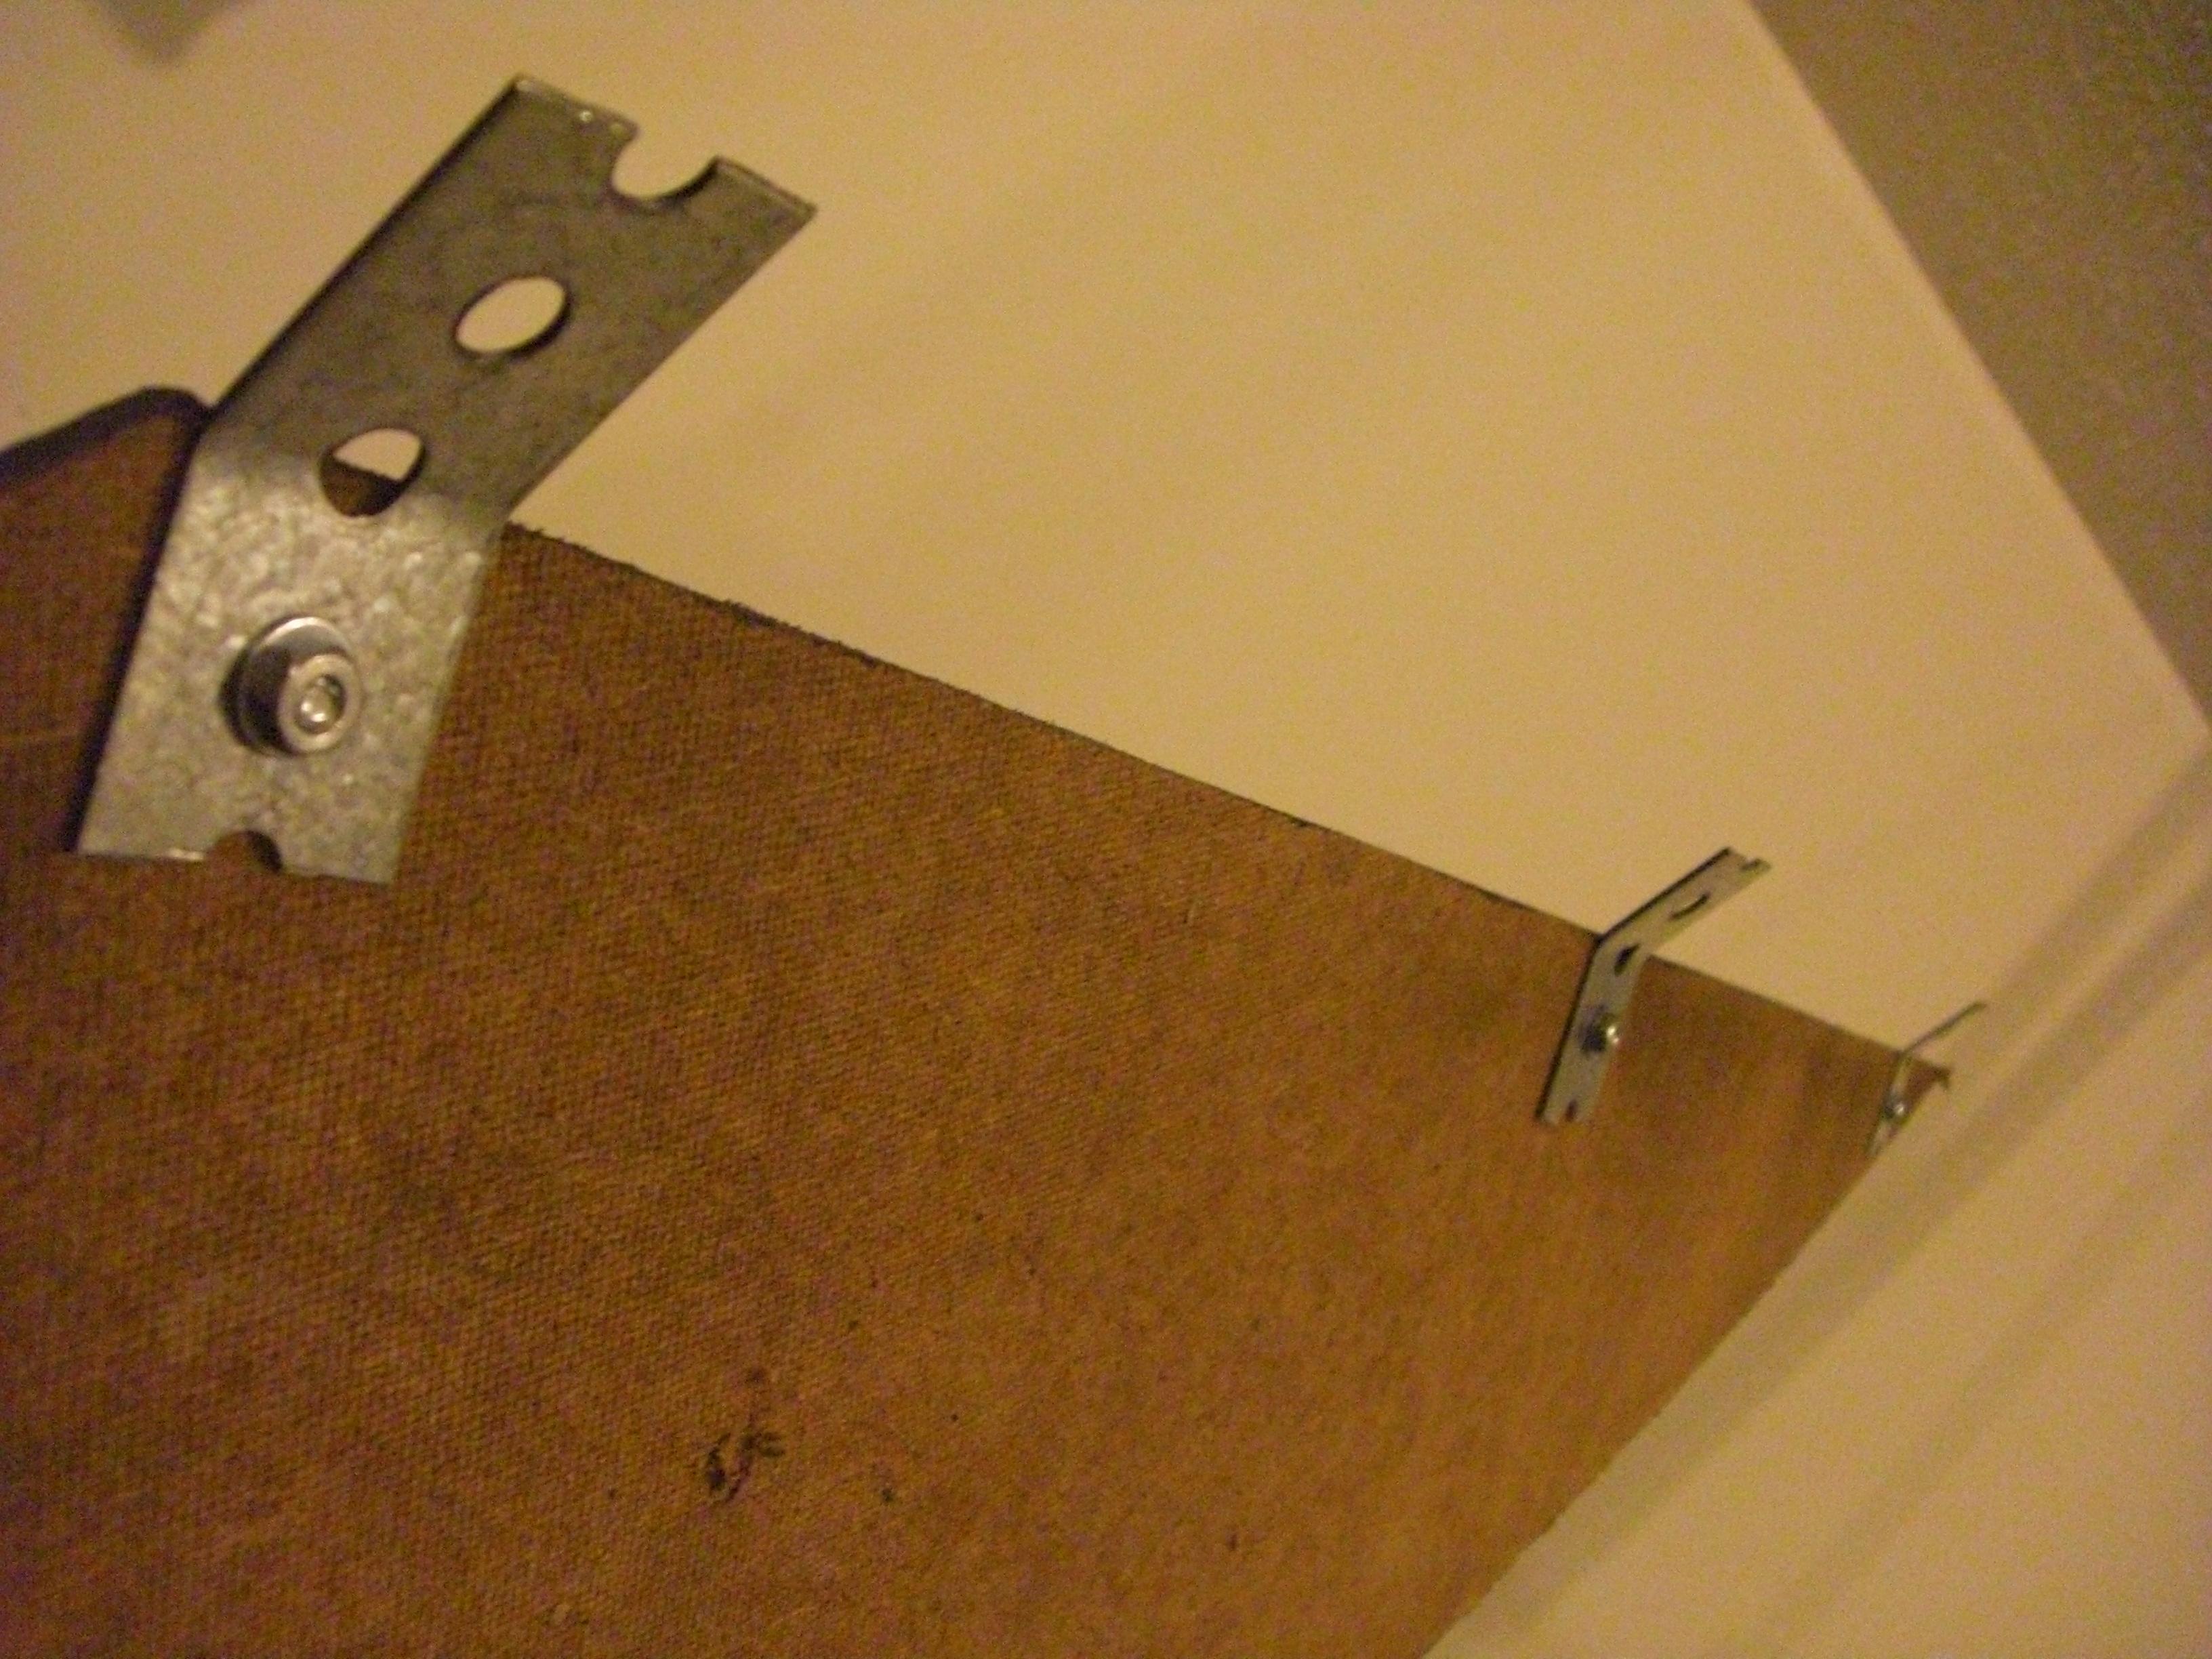 Picture of Panel Attachment Hardware